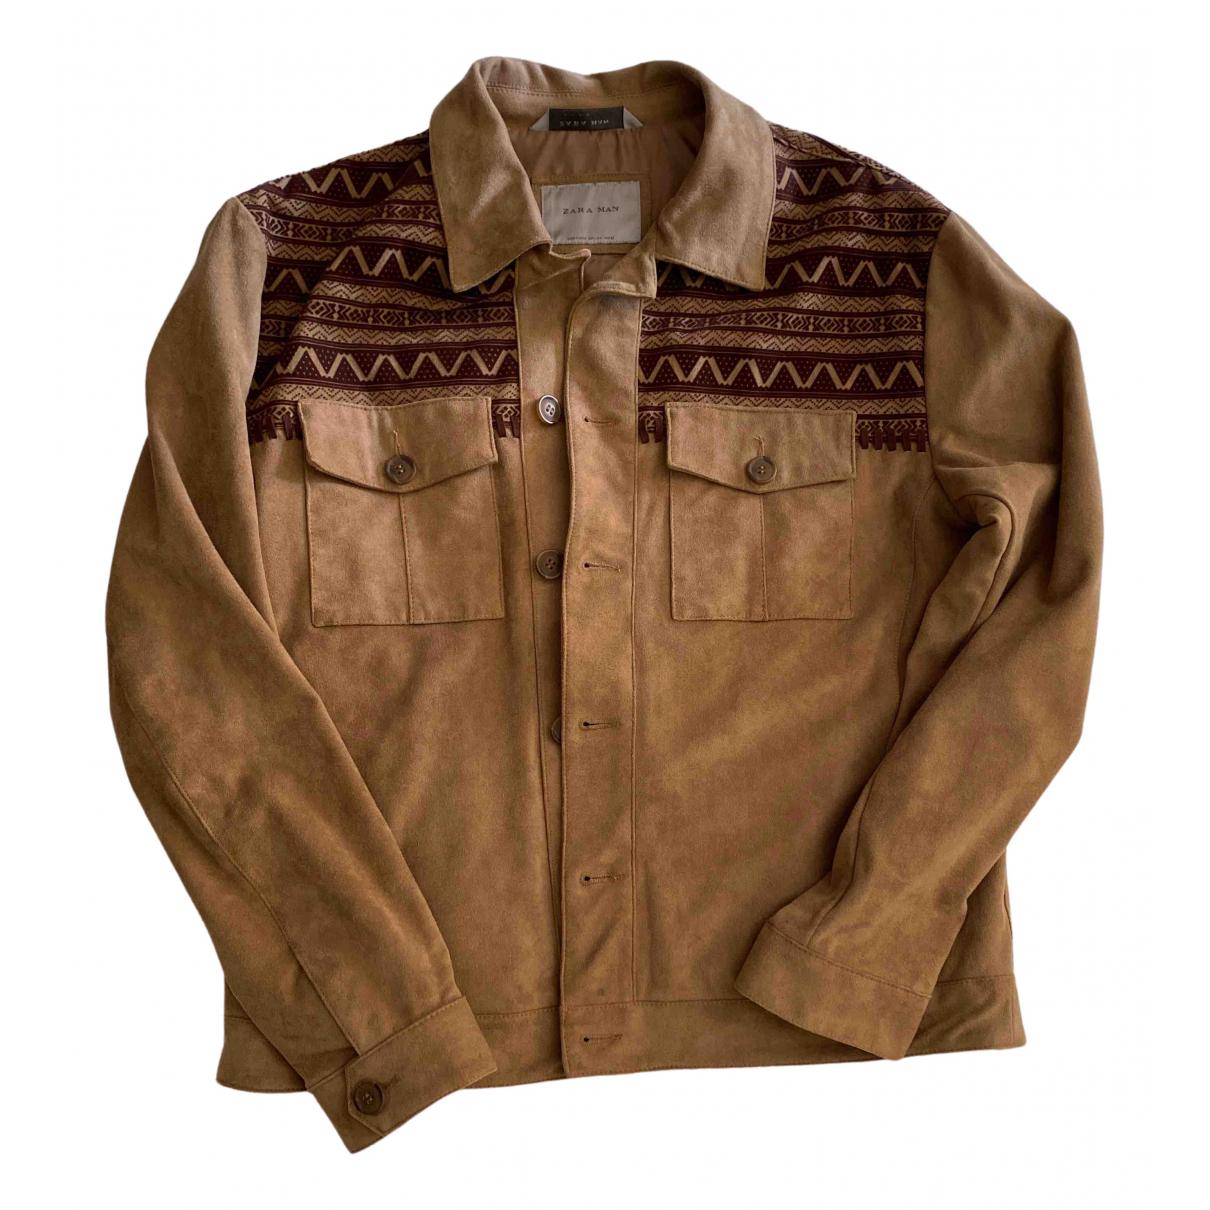 Zara \N Camel jacket  for Men L International